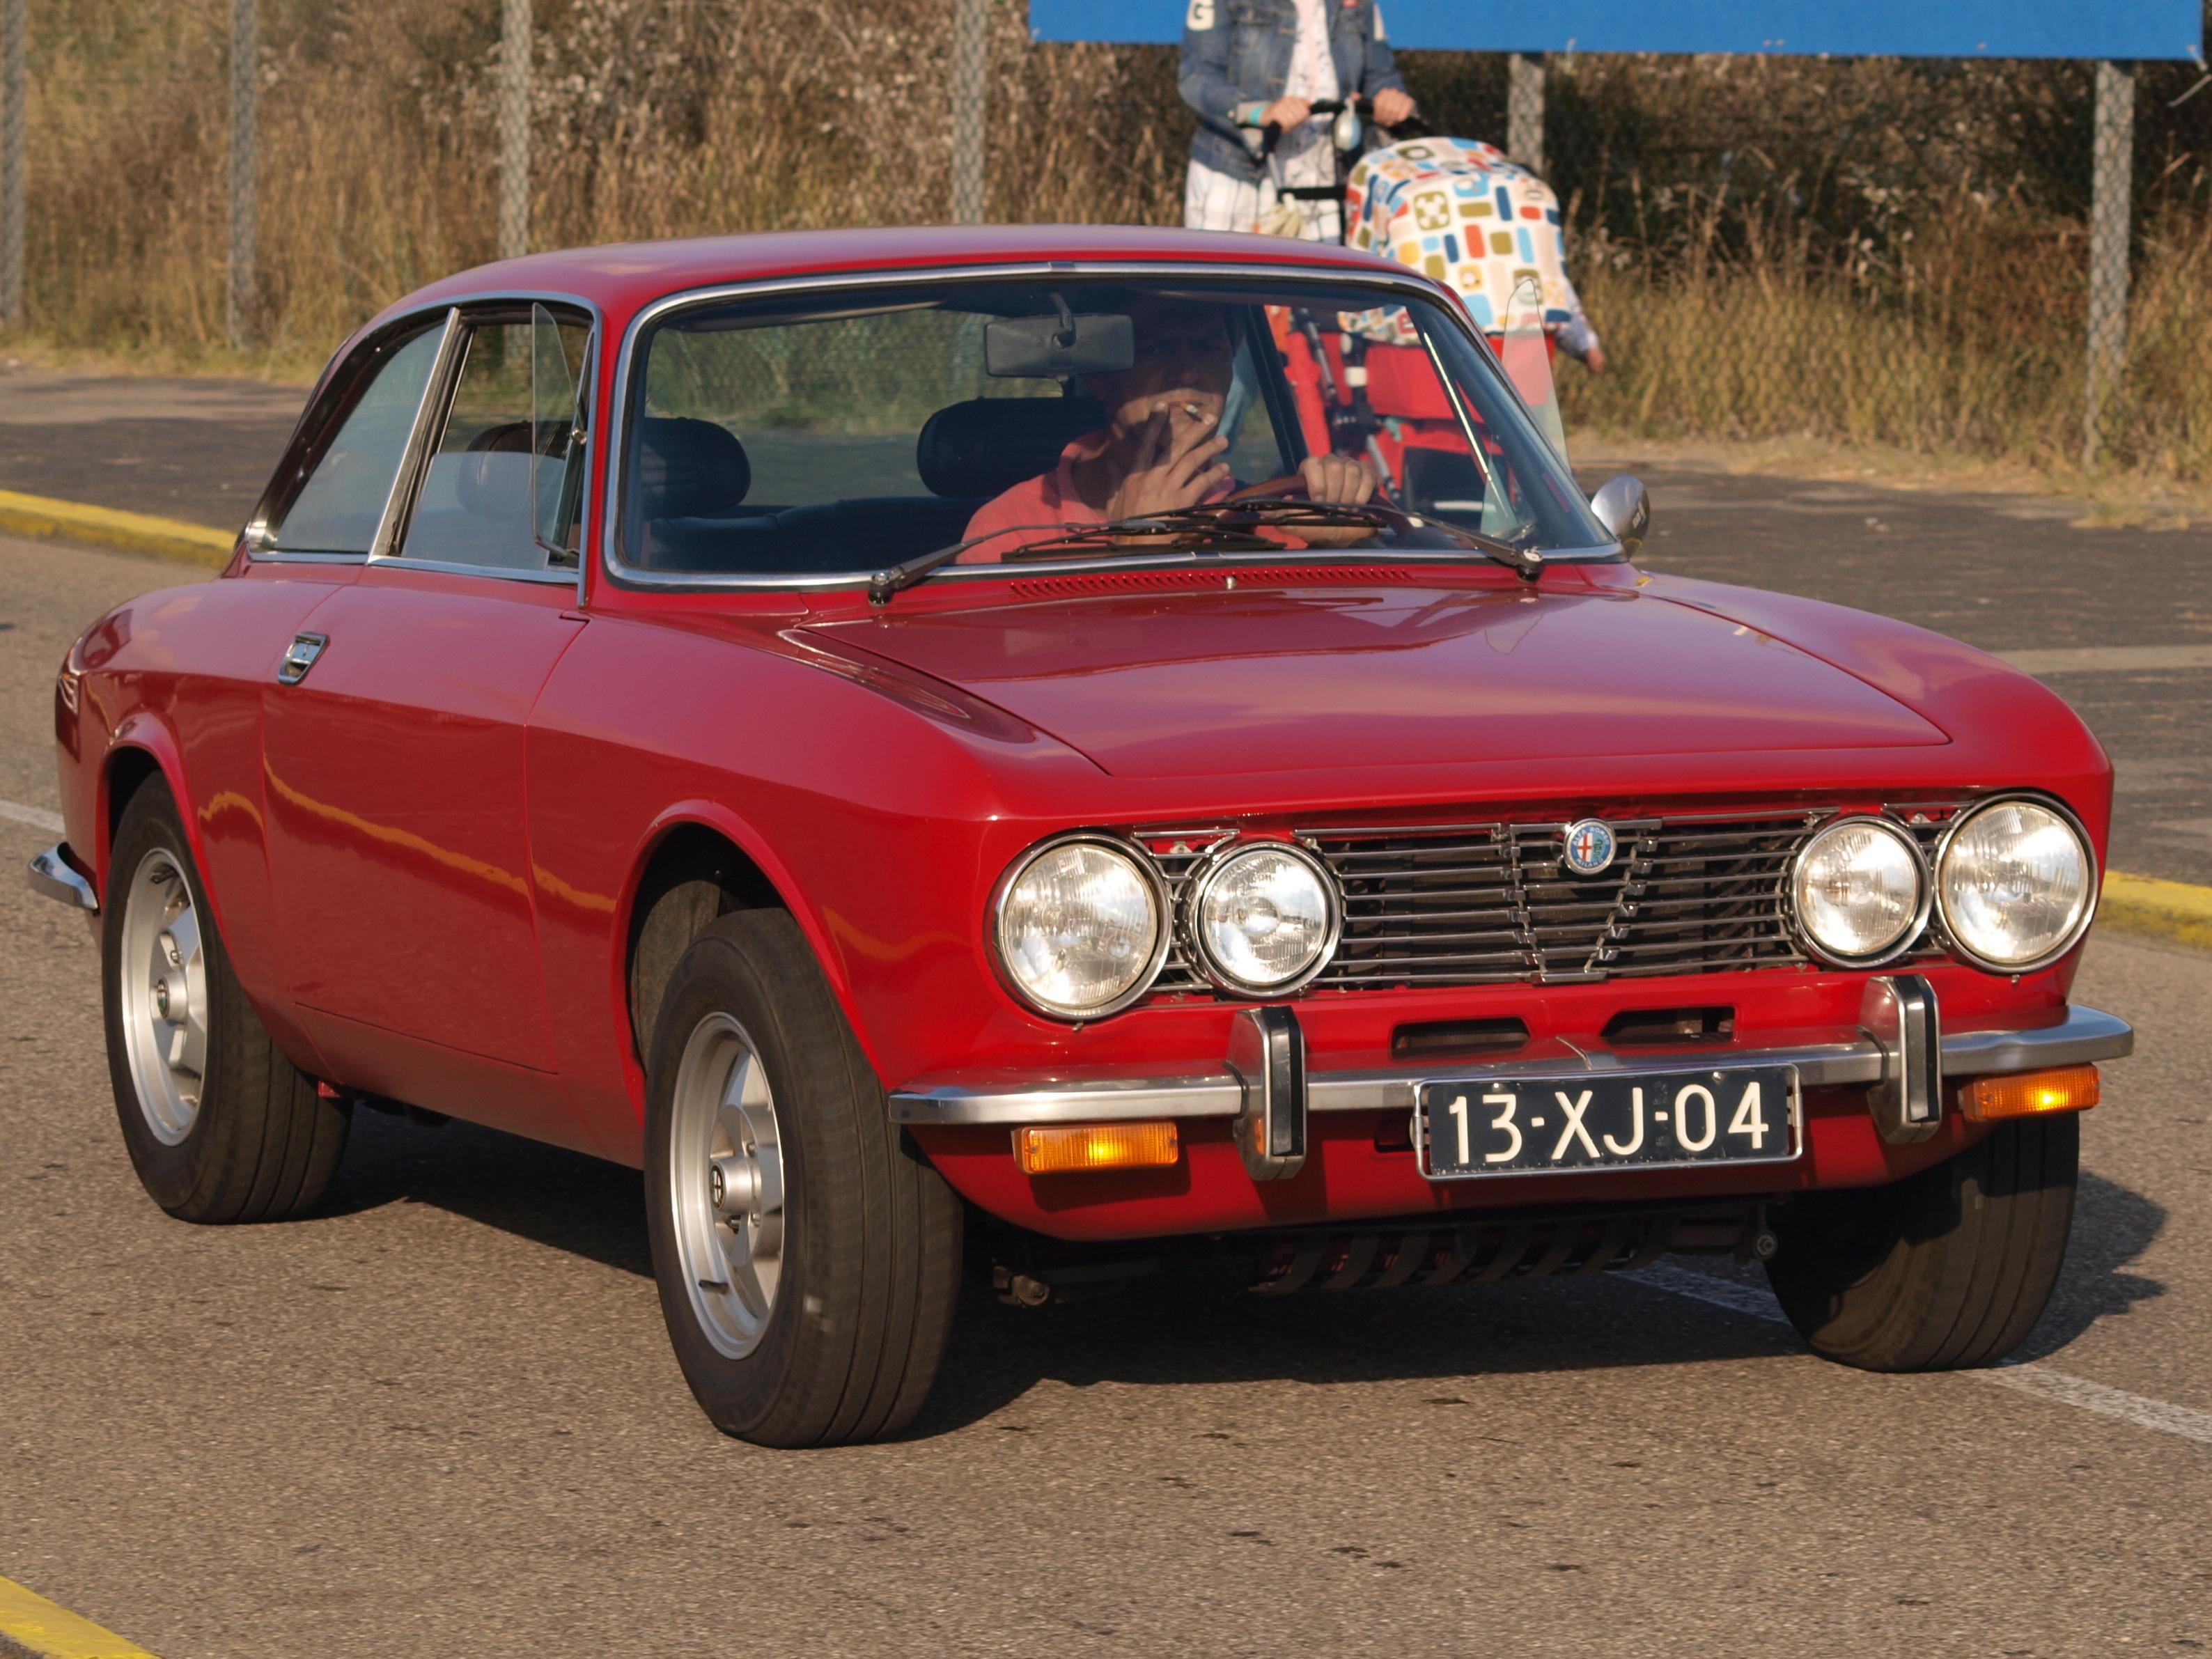 alfa romeo gtv images start 150 WeiLi Automotive Network